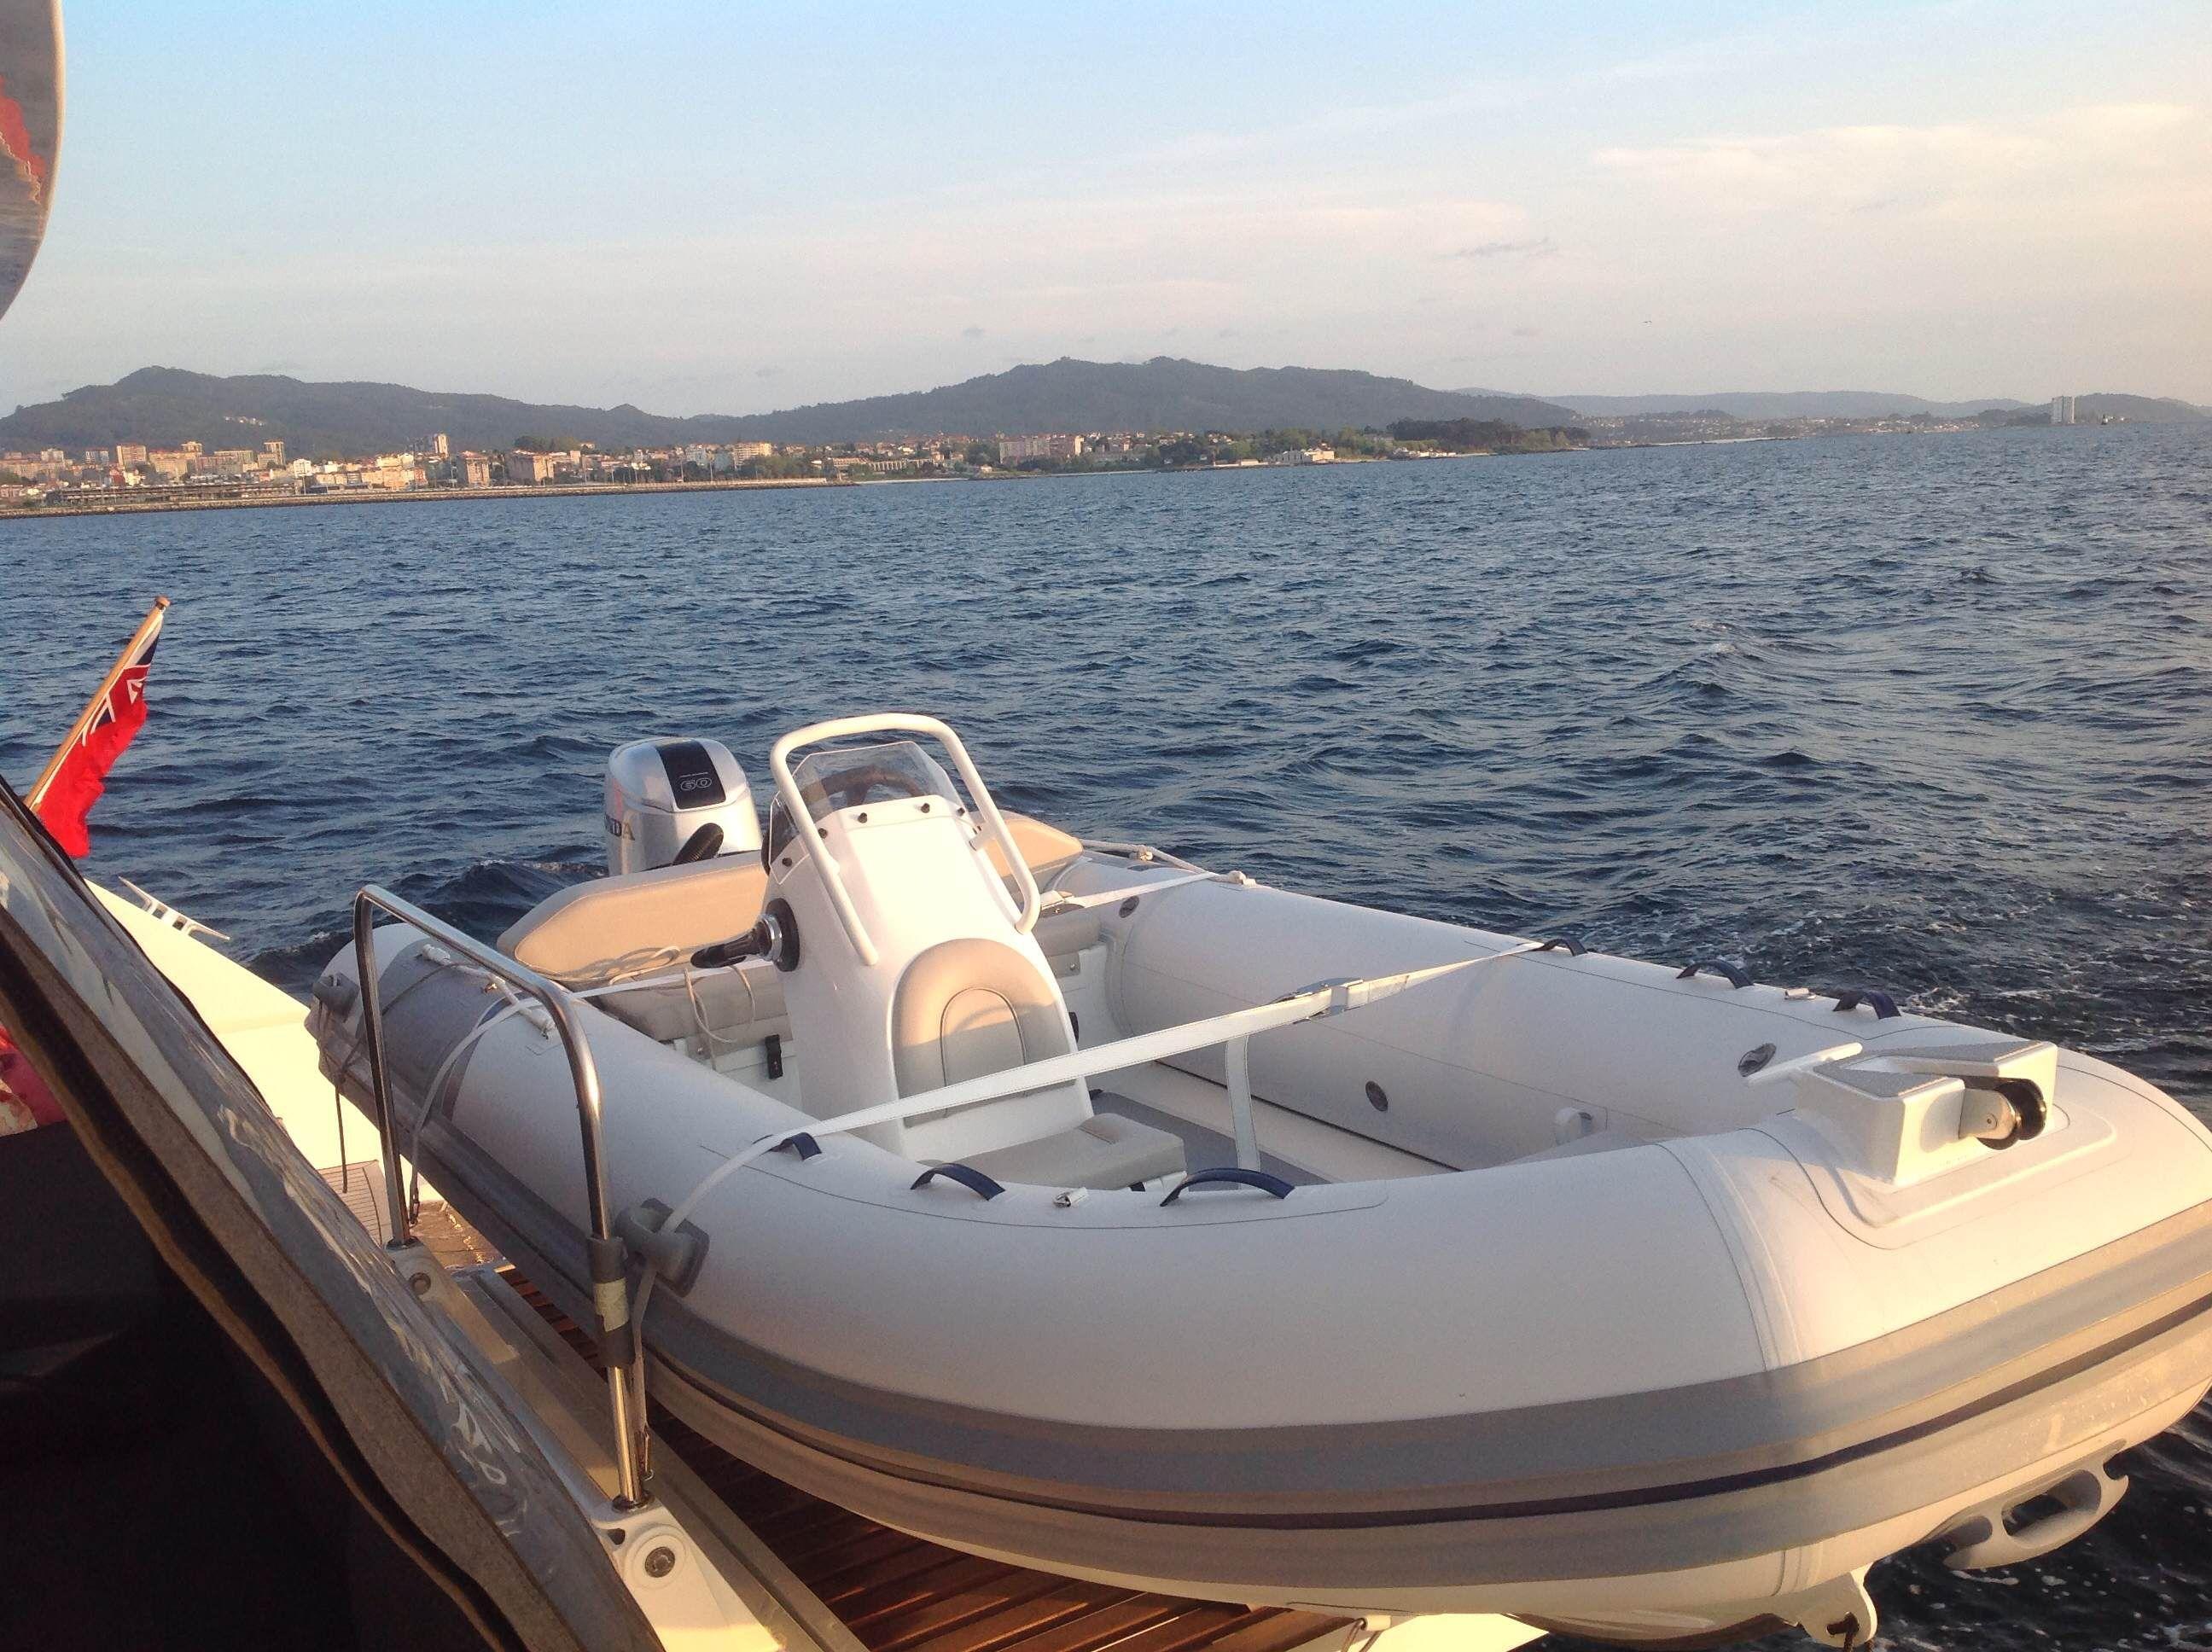 KASKAZI FOUR Lagoon 620 Luxury Catamaran Tender